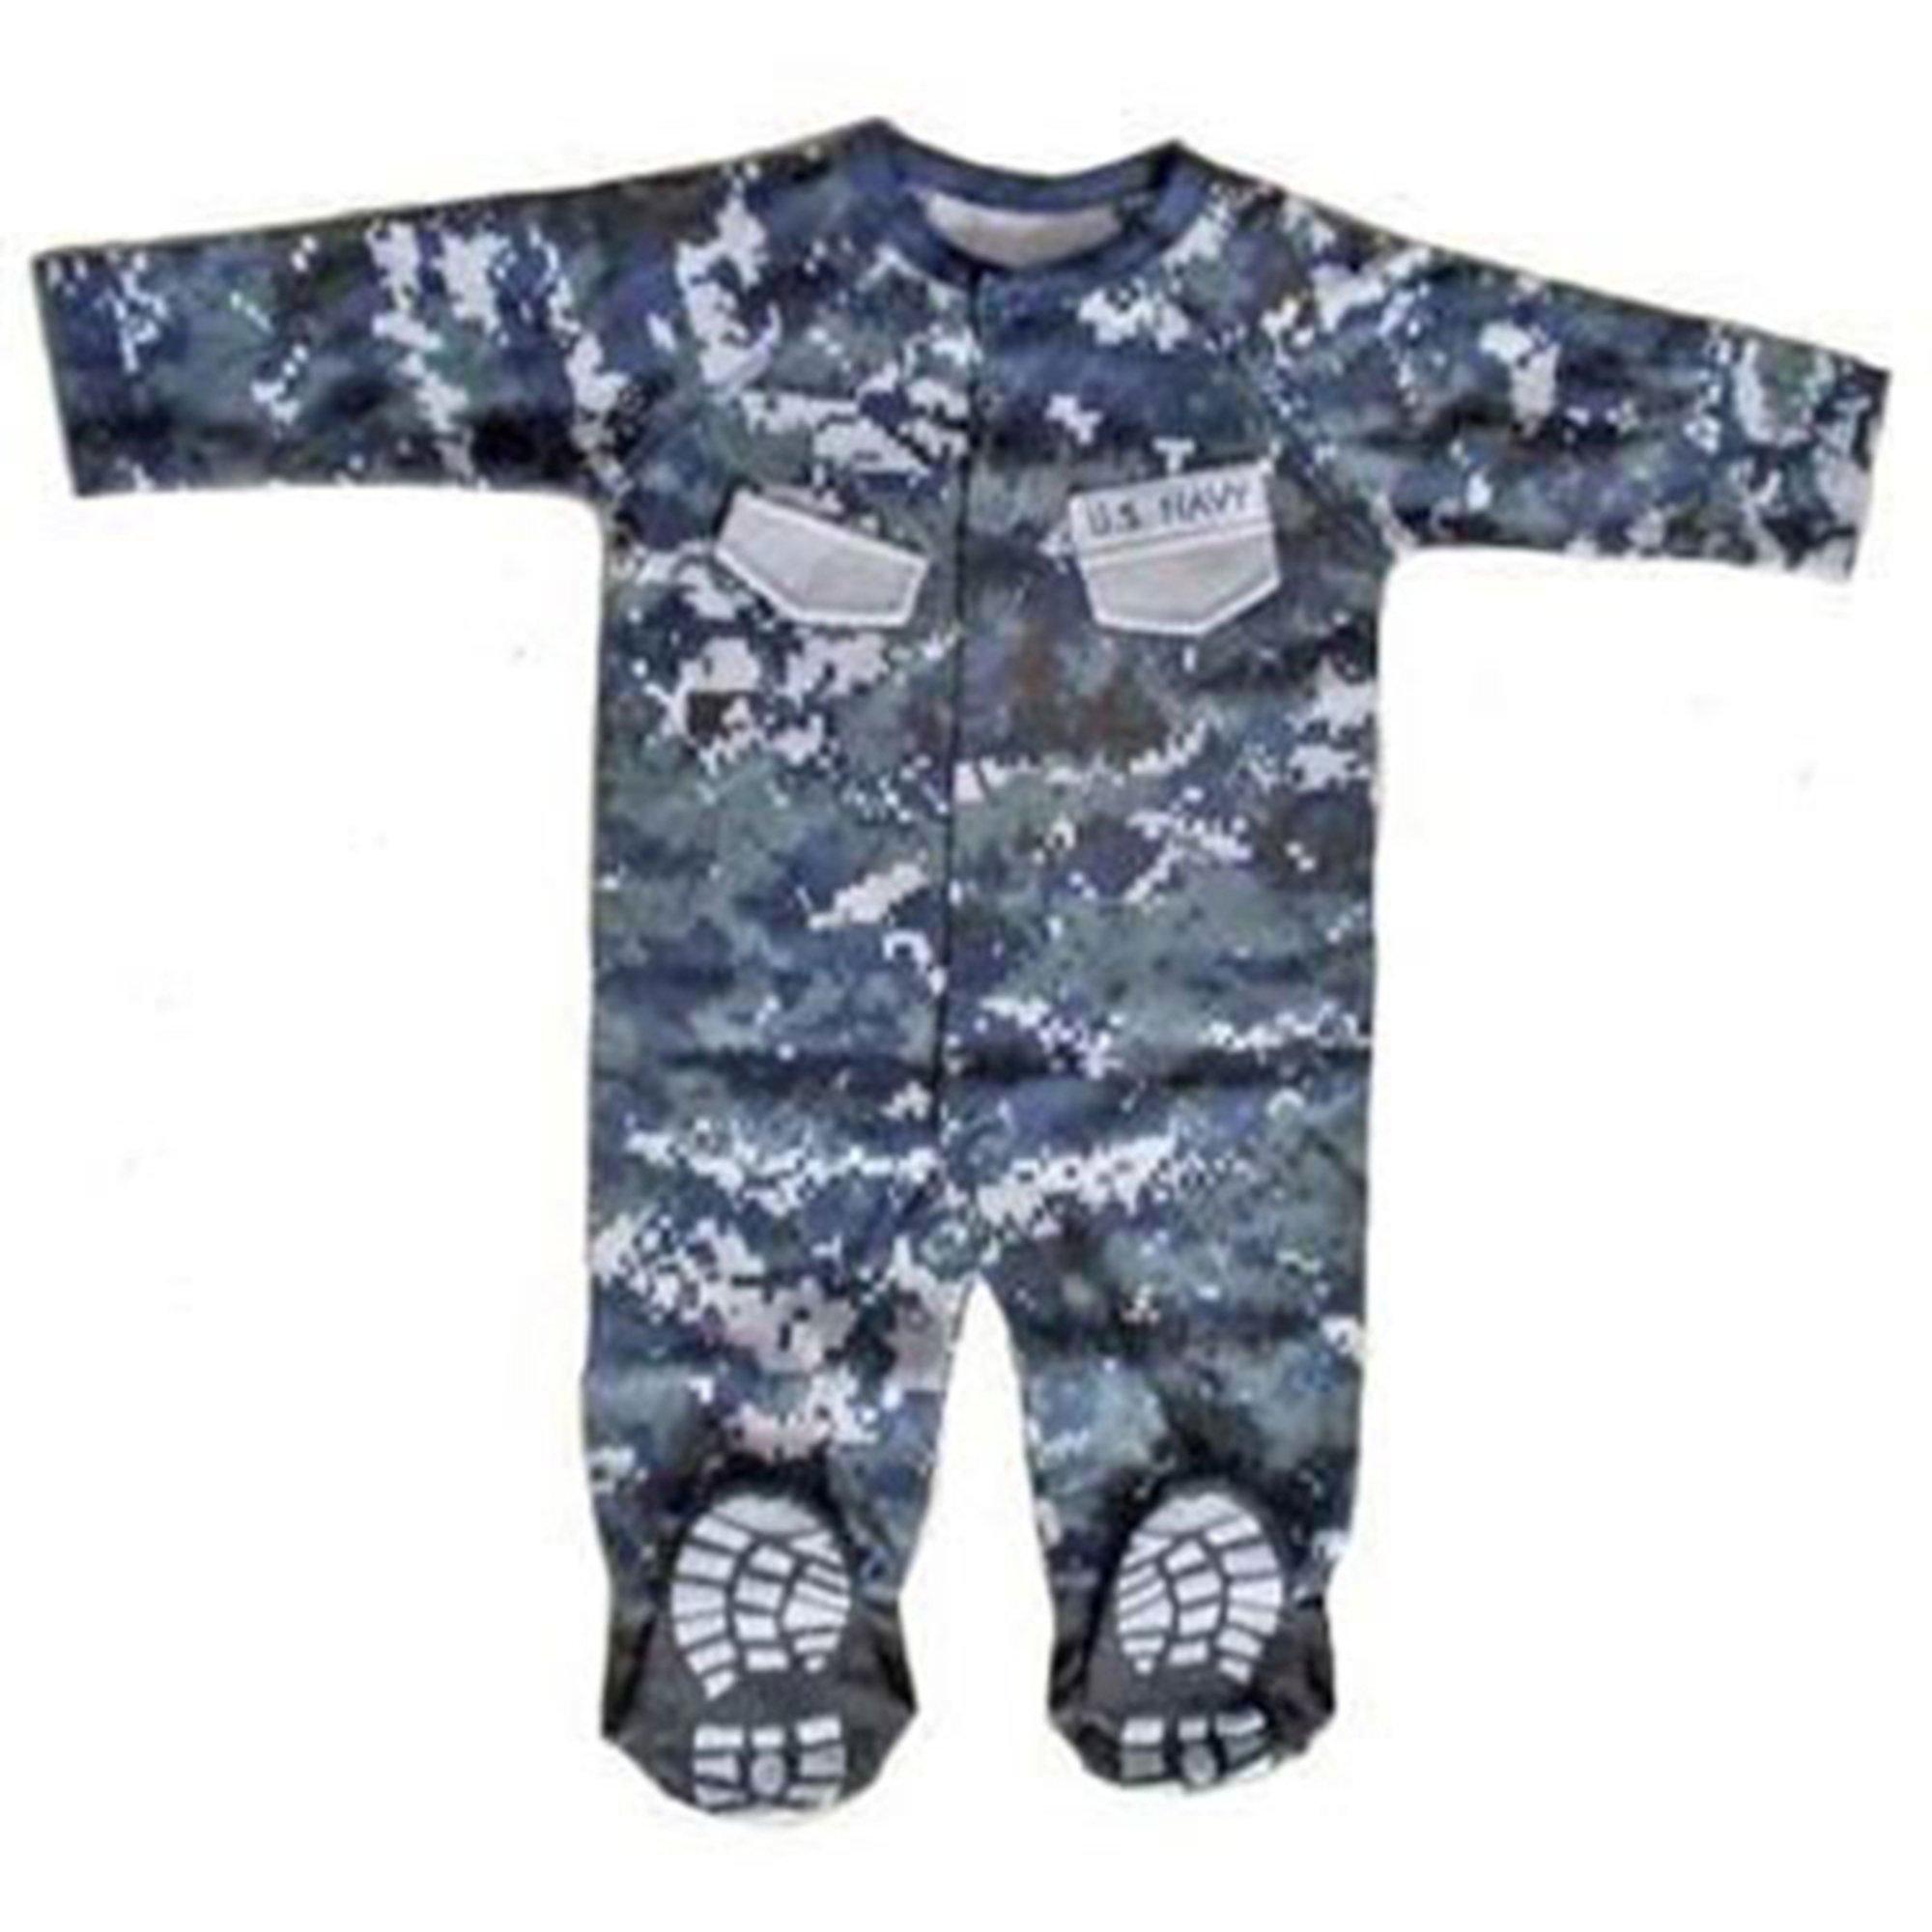 Nwu uniform crawler w boots d navy pride baby clothing kids shop your navy exchange